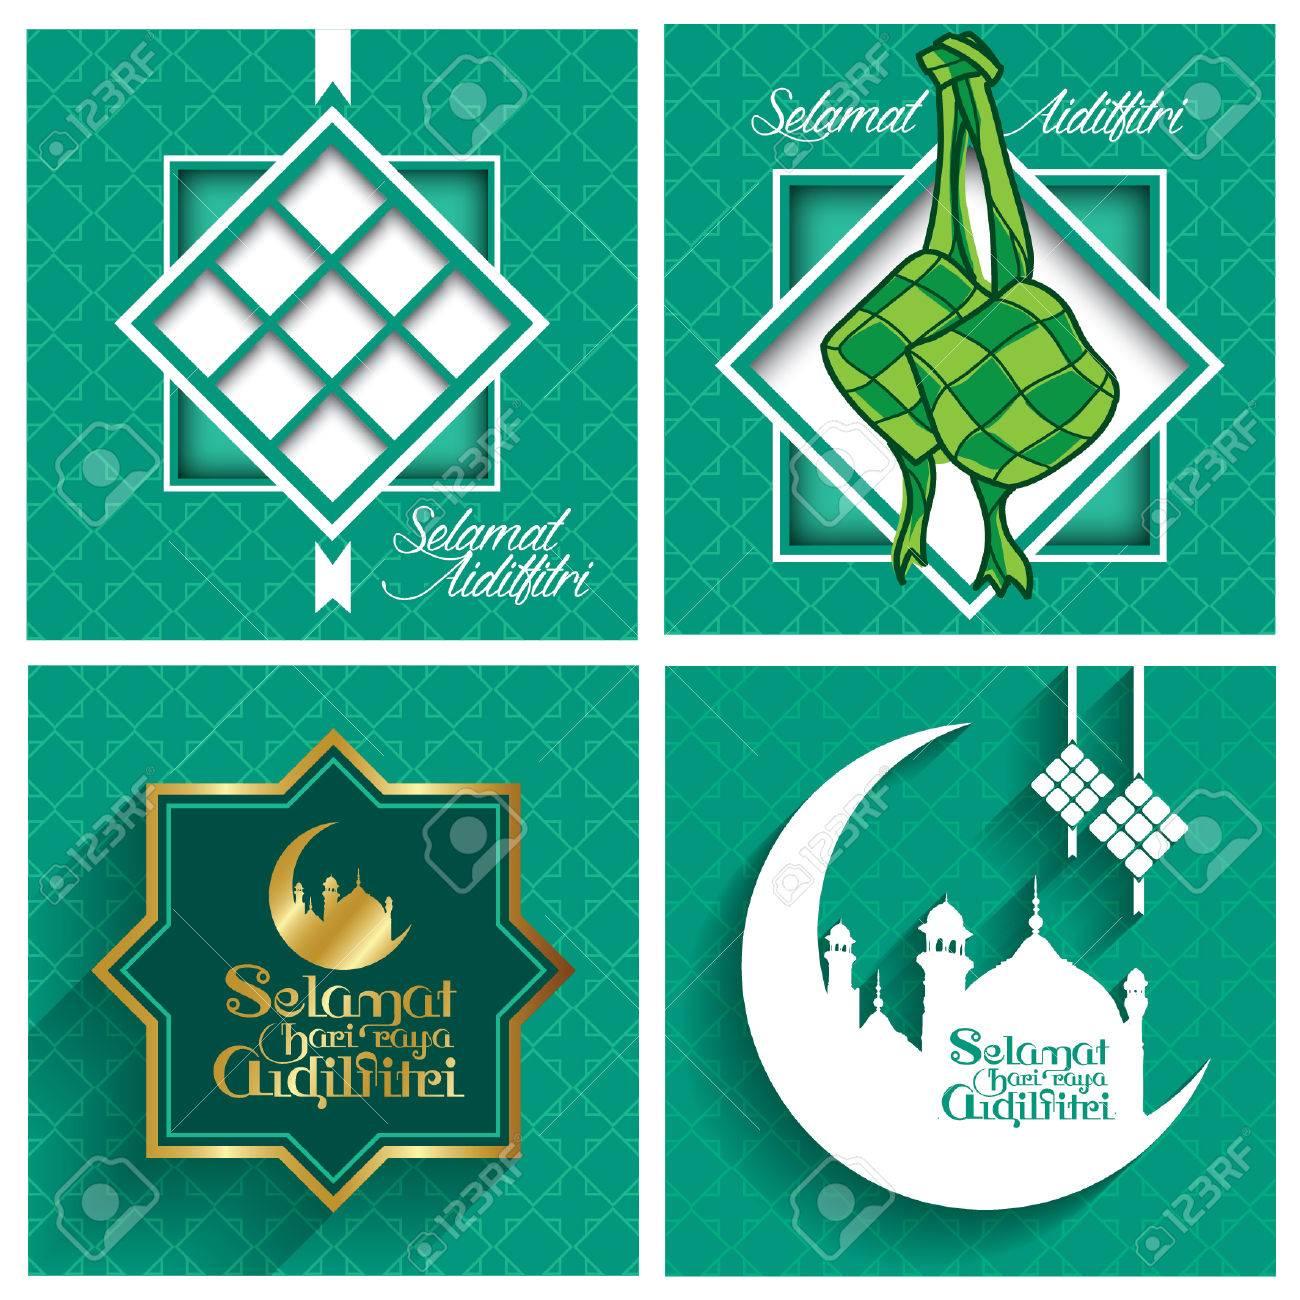 4 Set of Selamat Hari Raya Aidilfitri Vector Design (Translation: Celebration of Breaking Fast) - 77669942